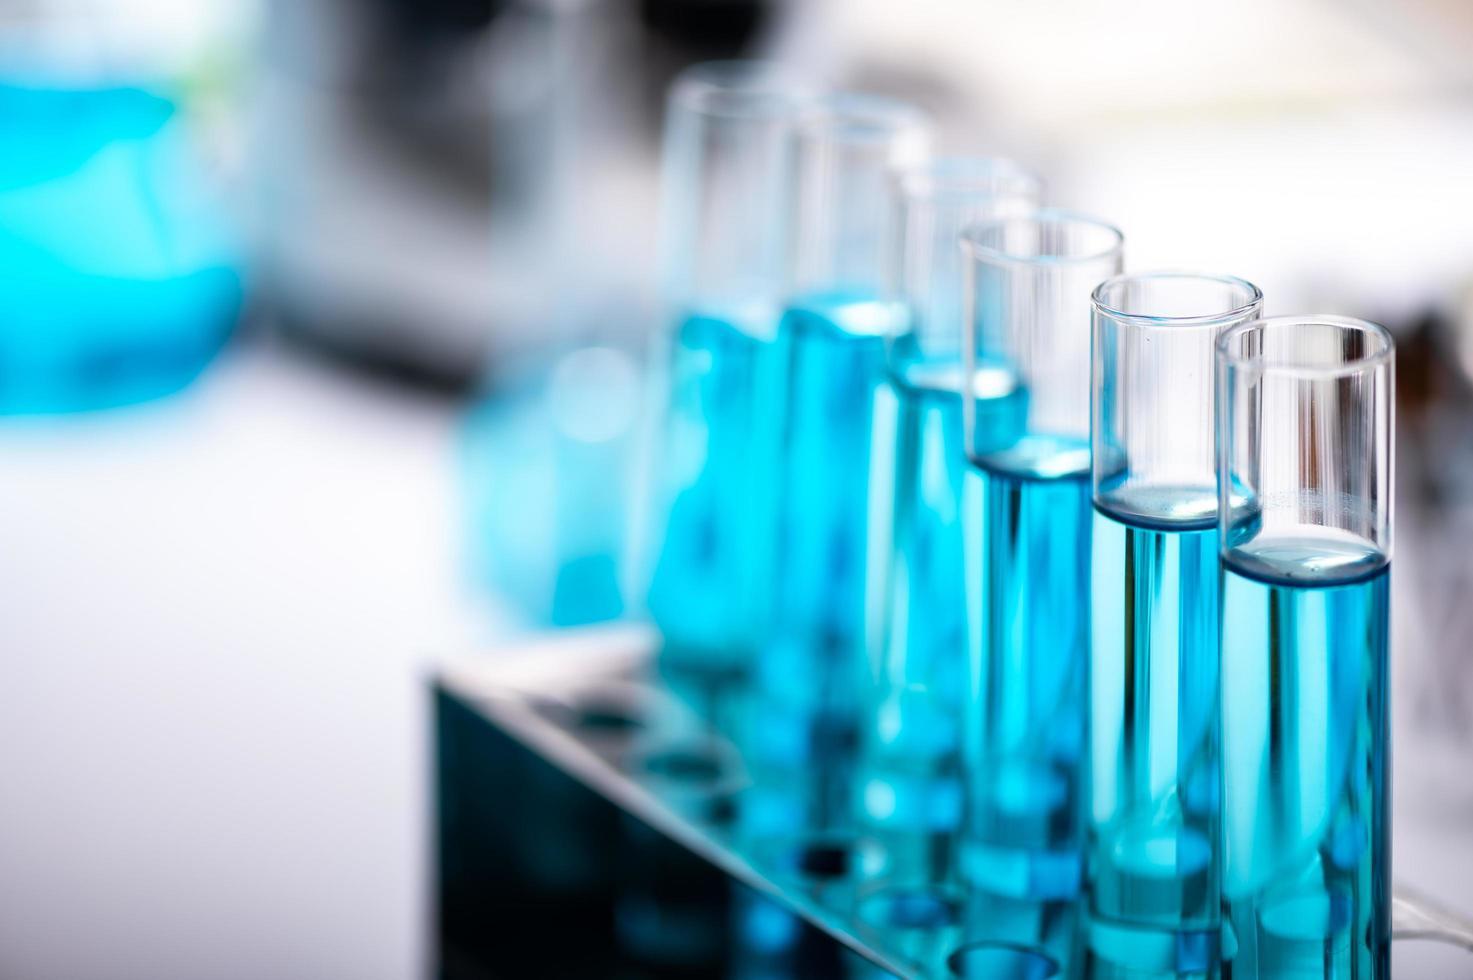 tubes à essai bleus photo